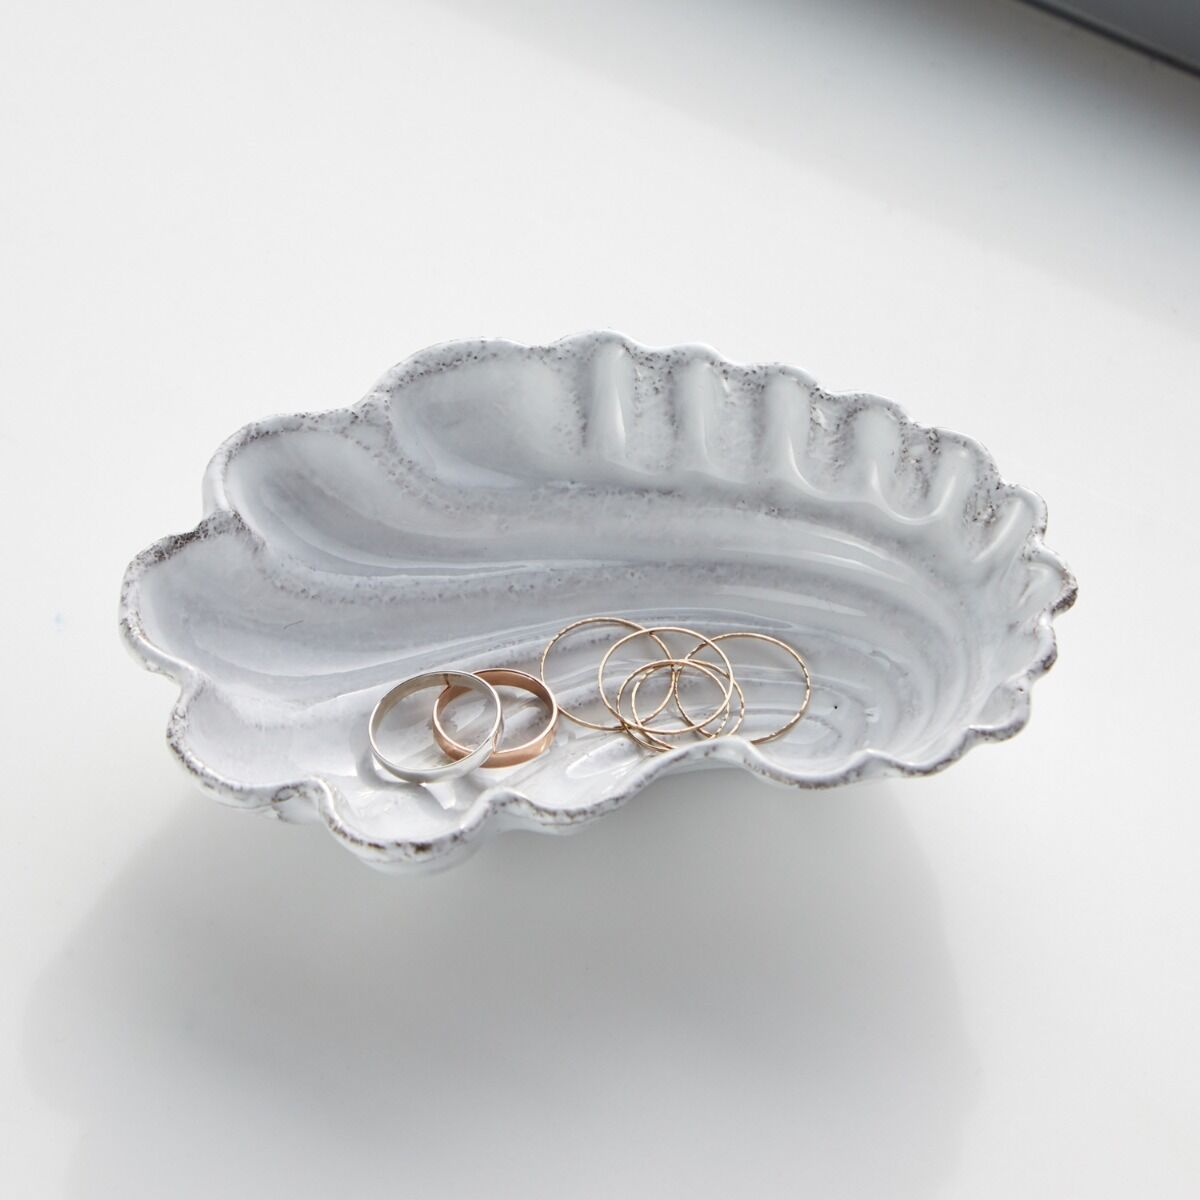 Coquillage Dish image